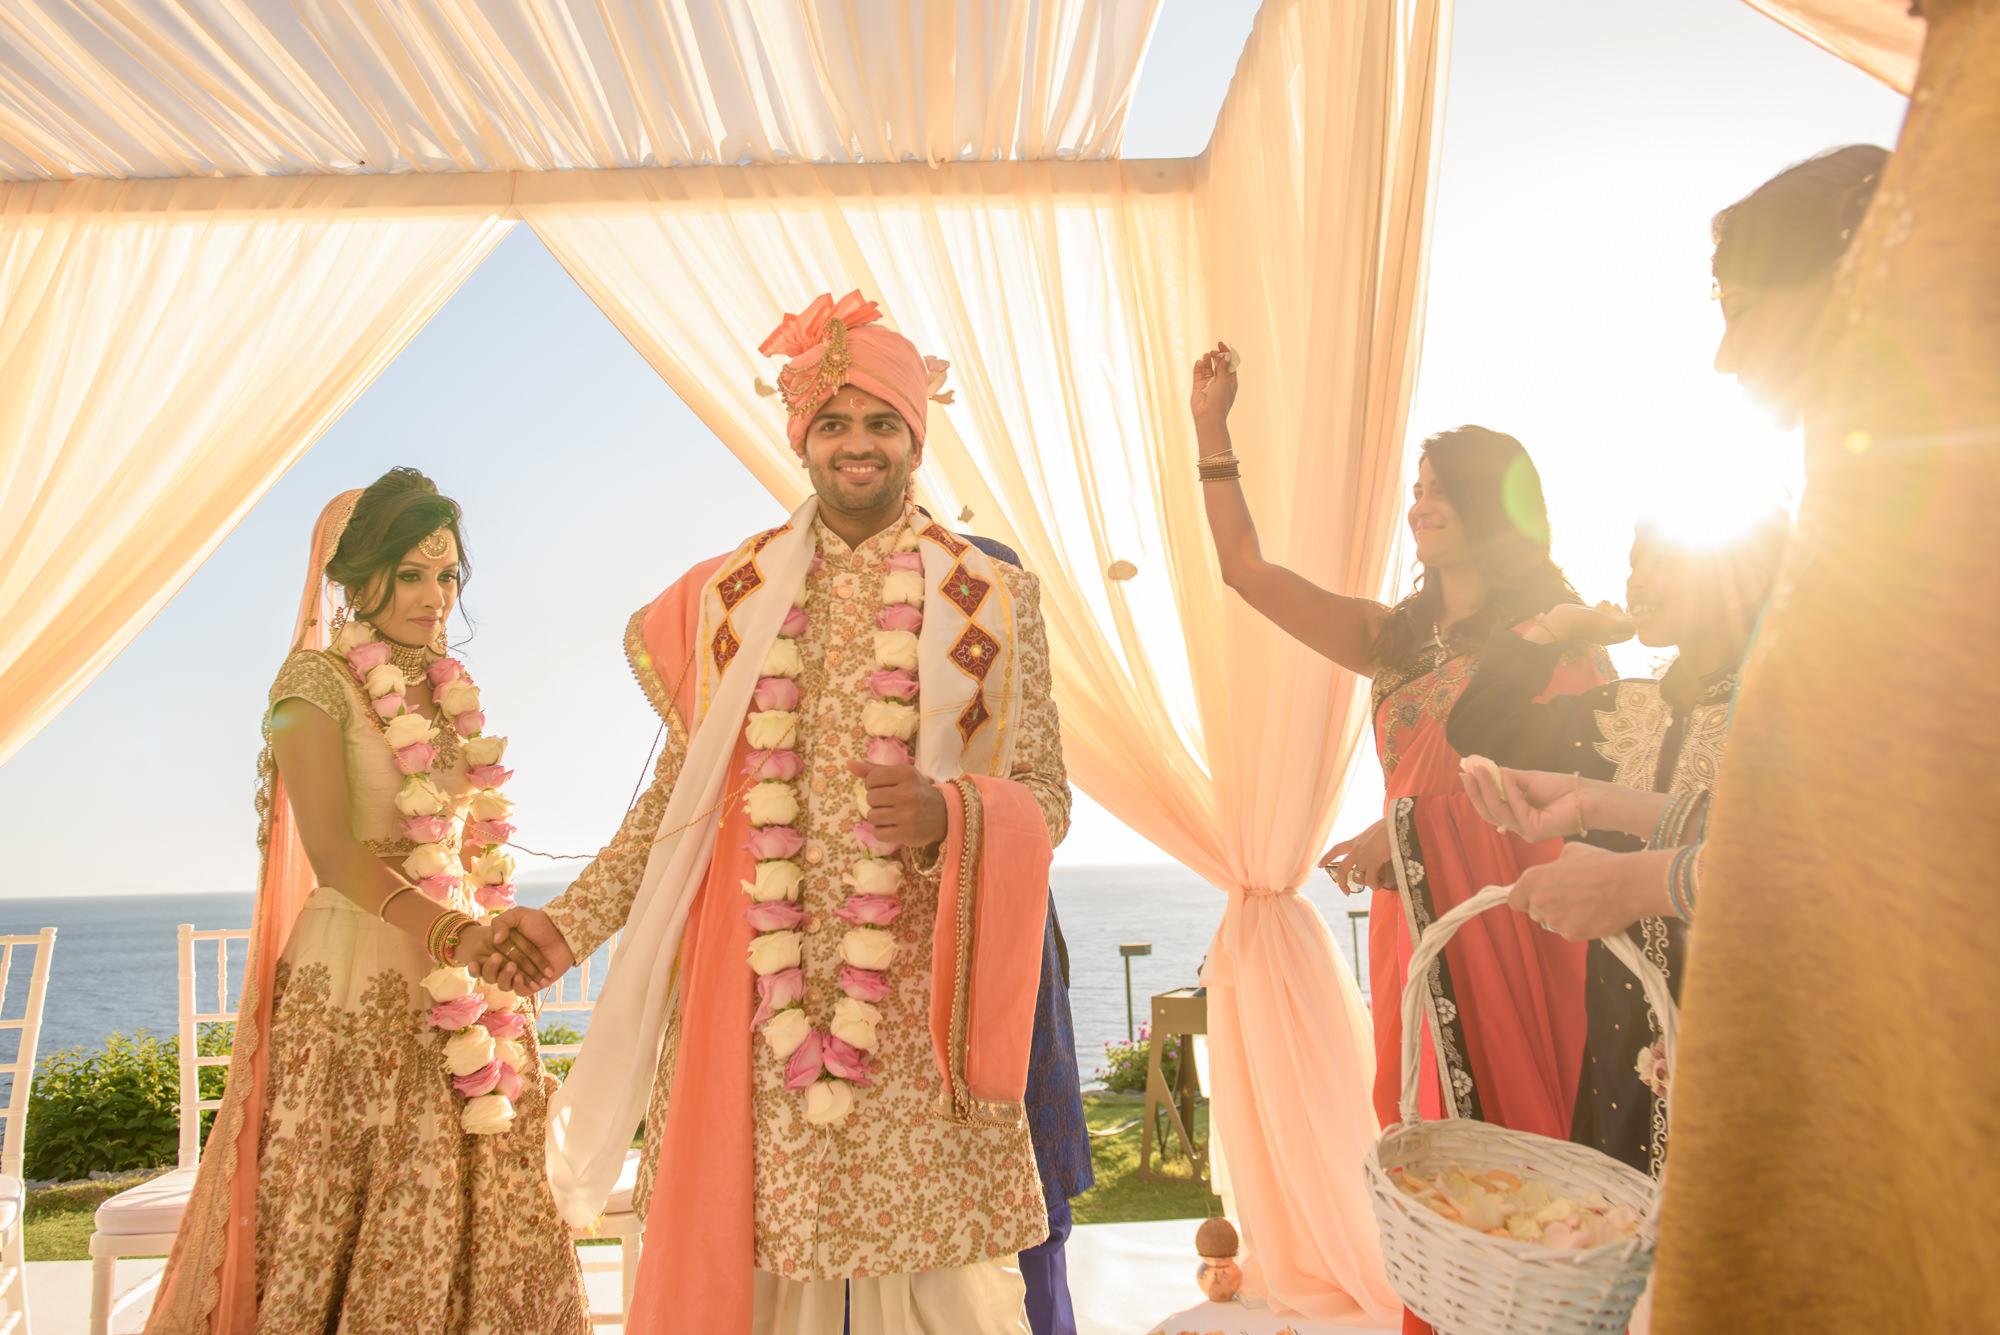 satnam photography wedding indian asian hindu destination wedding photographer tenerife ritz carlton abama-184.jpg